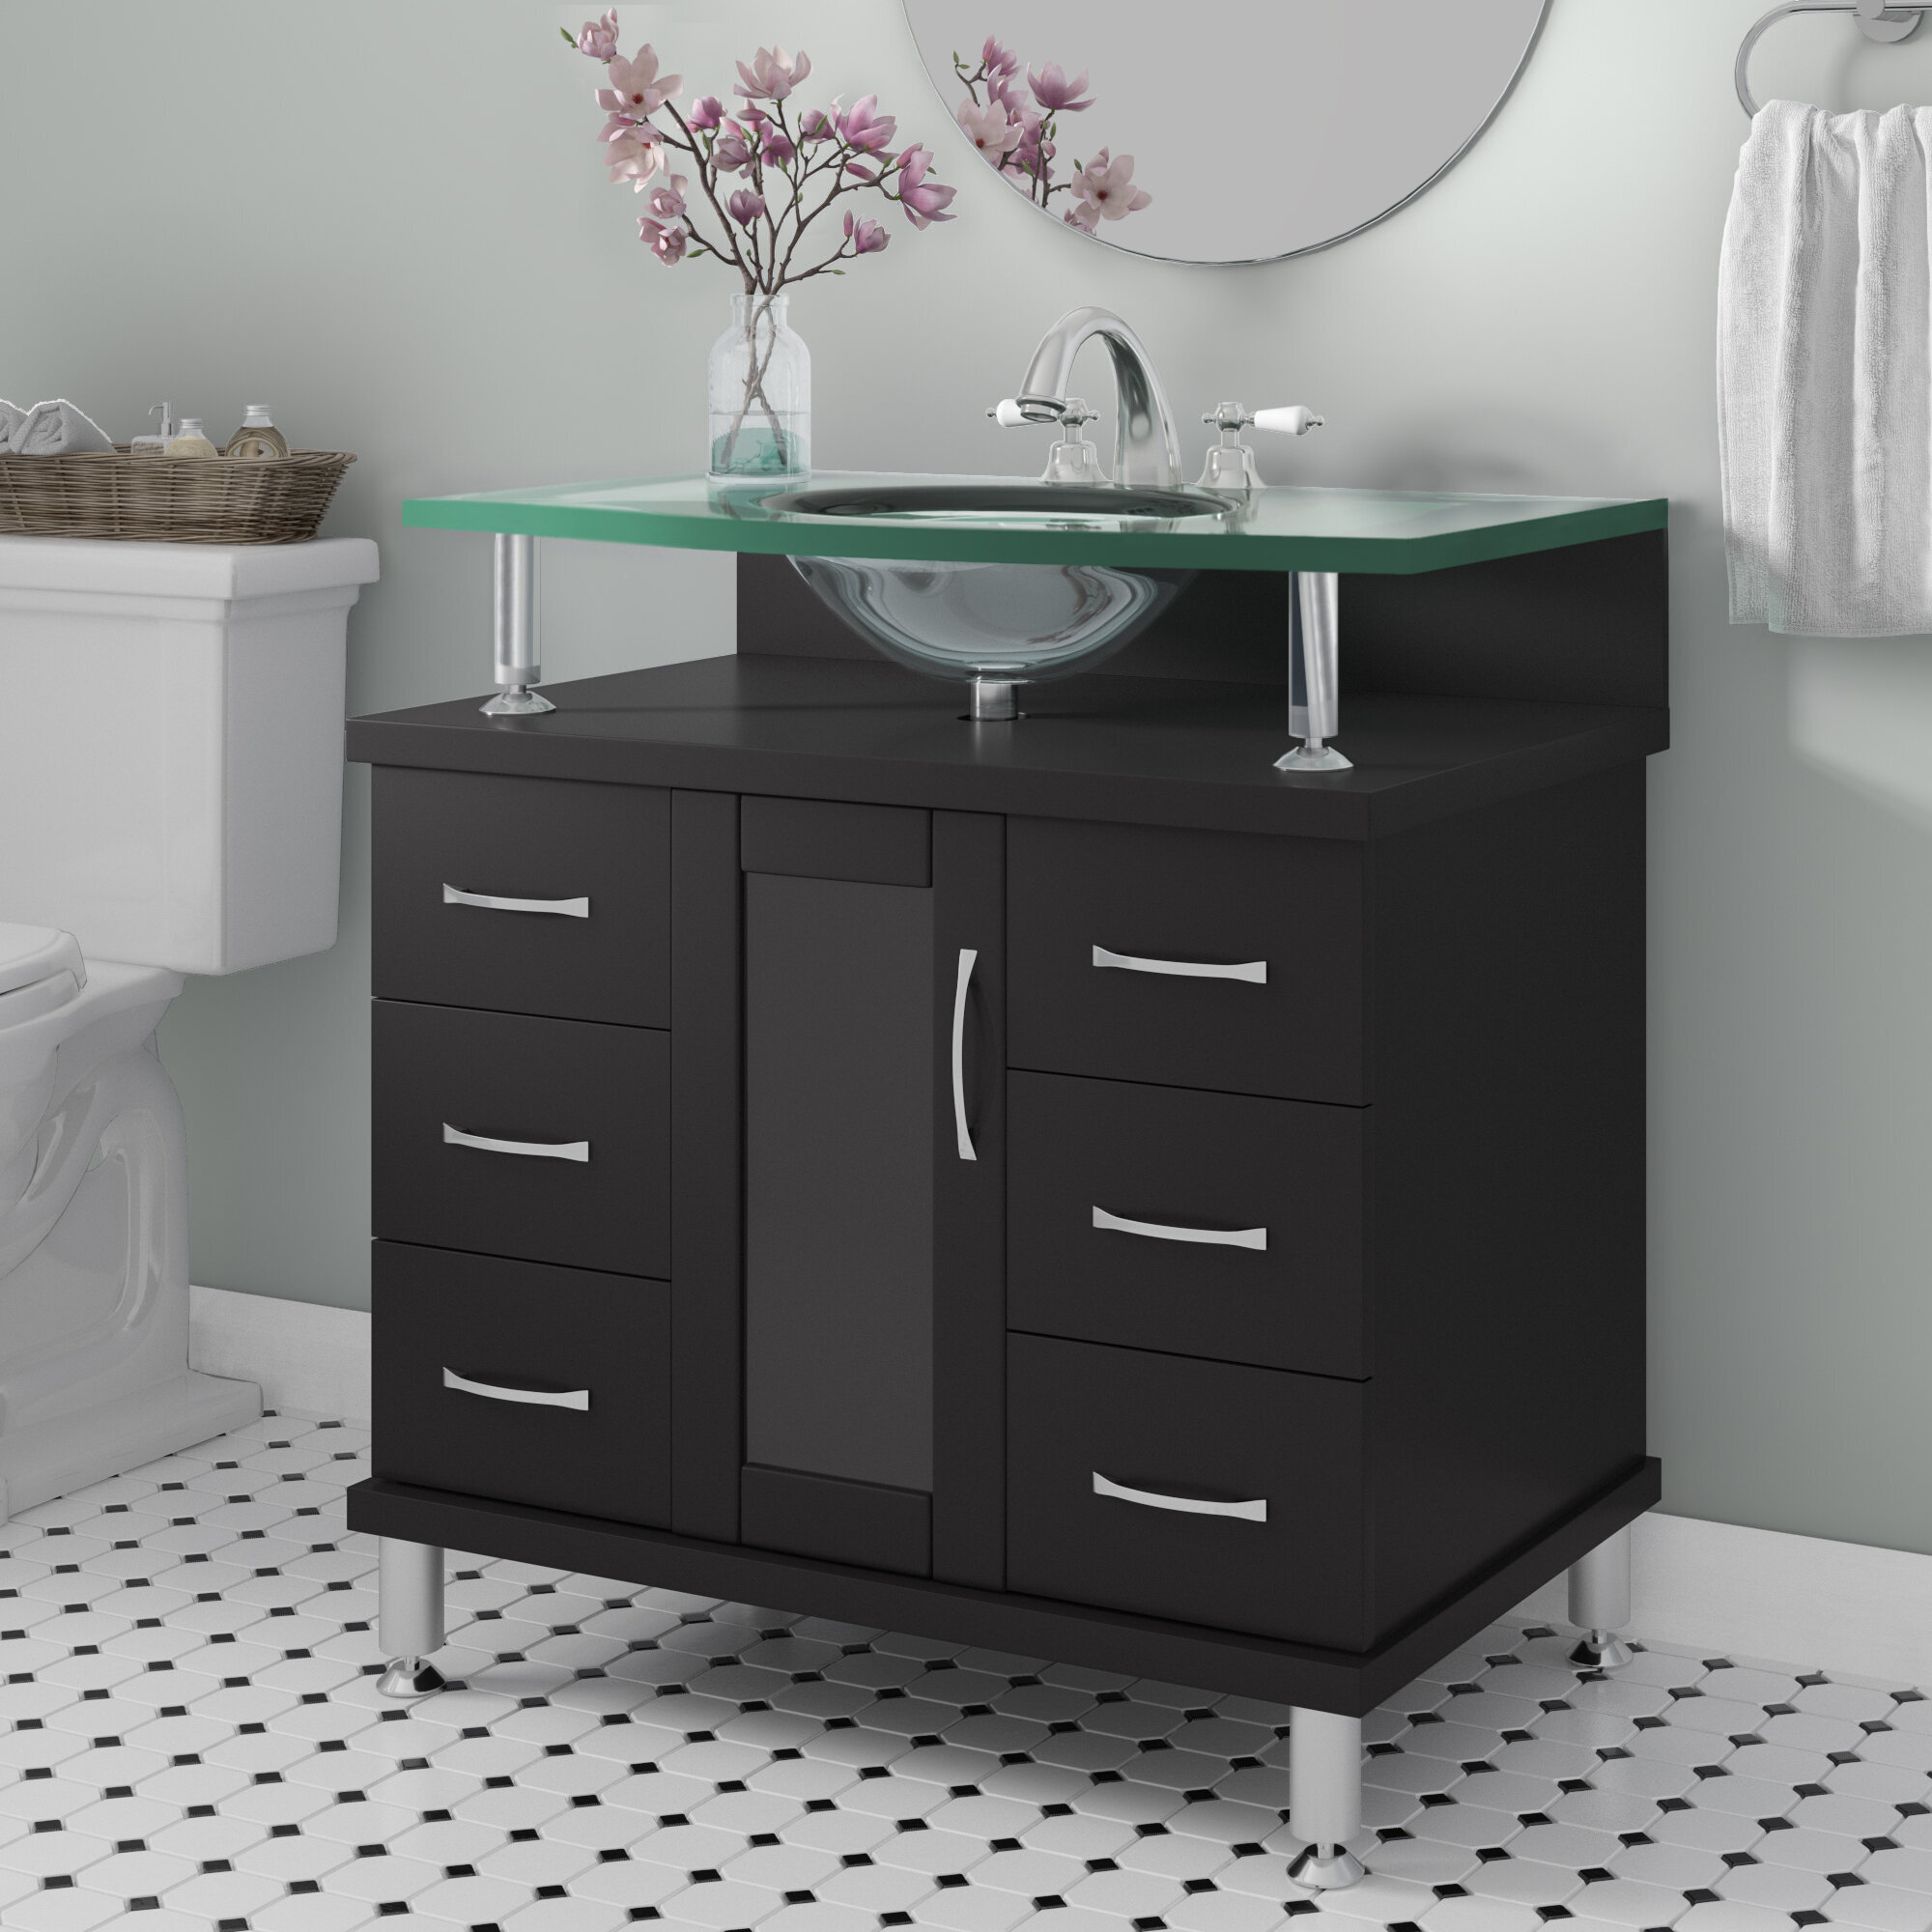 Latitude Run Runge 32 Single Bathroom Vanity Set With Tempered Glass Top Reviews Wayfair